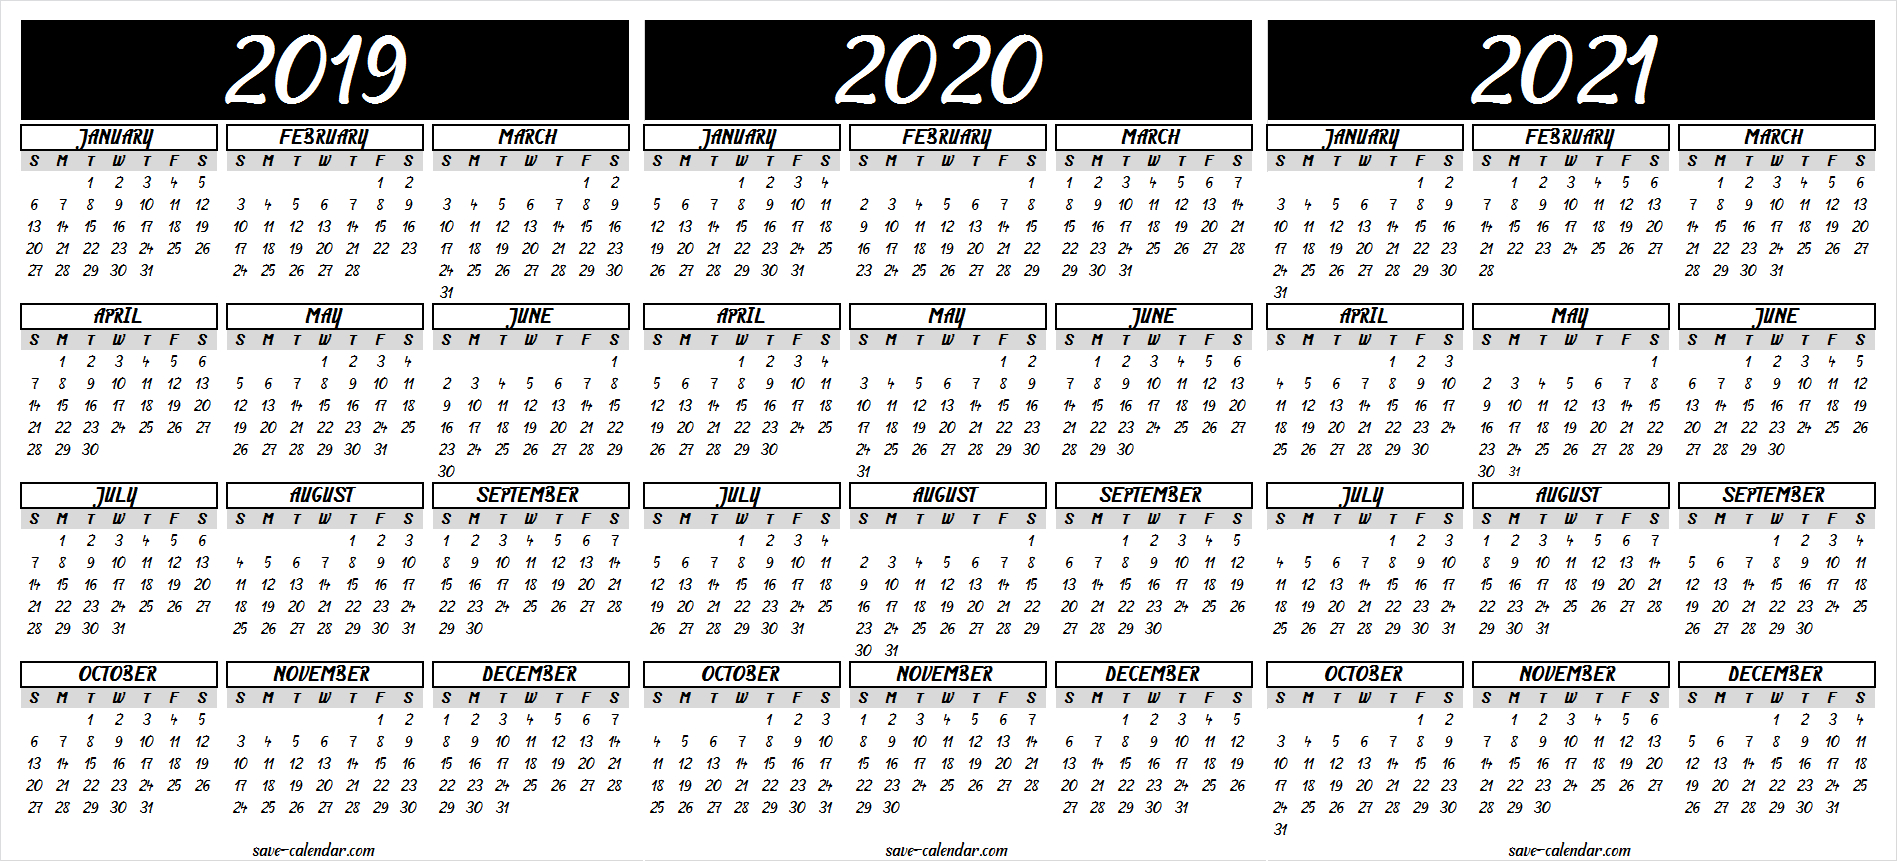 2019 2020 2021 Calendar Printable | 2021 Calendar, Free